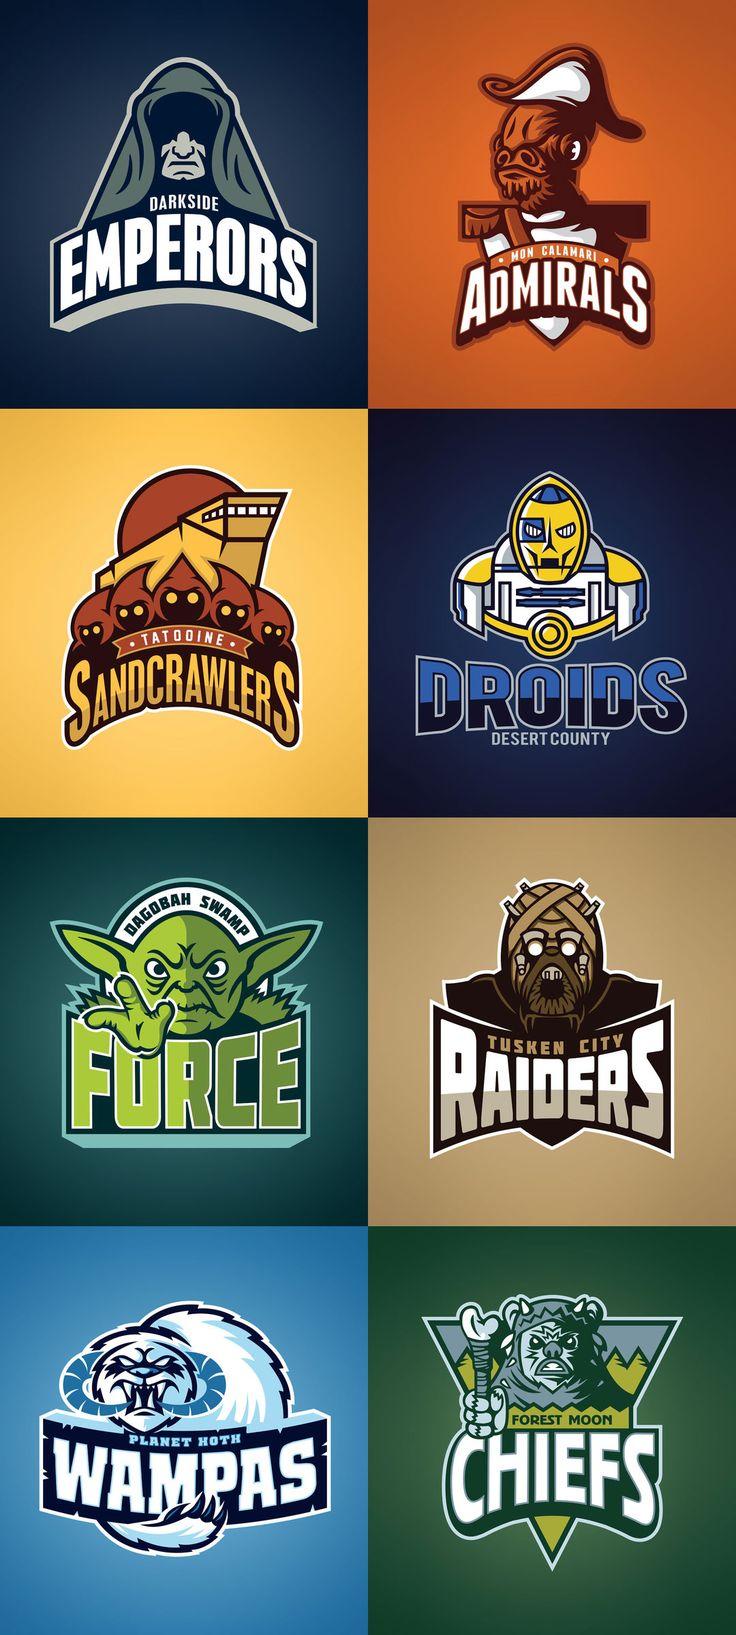 Star Wars sports team logos by David Creighton-Pester.